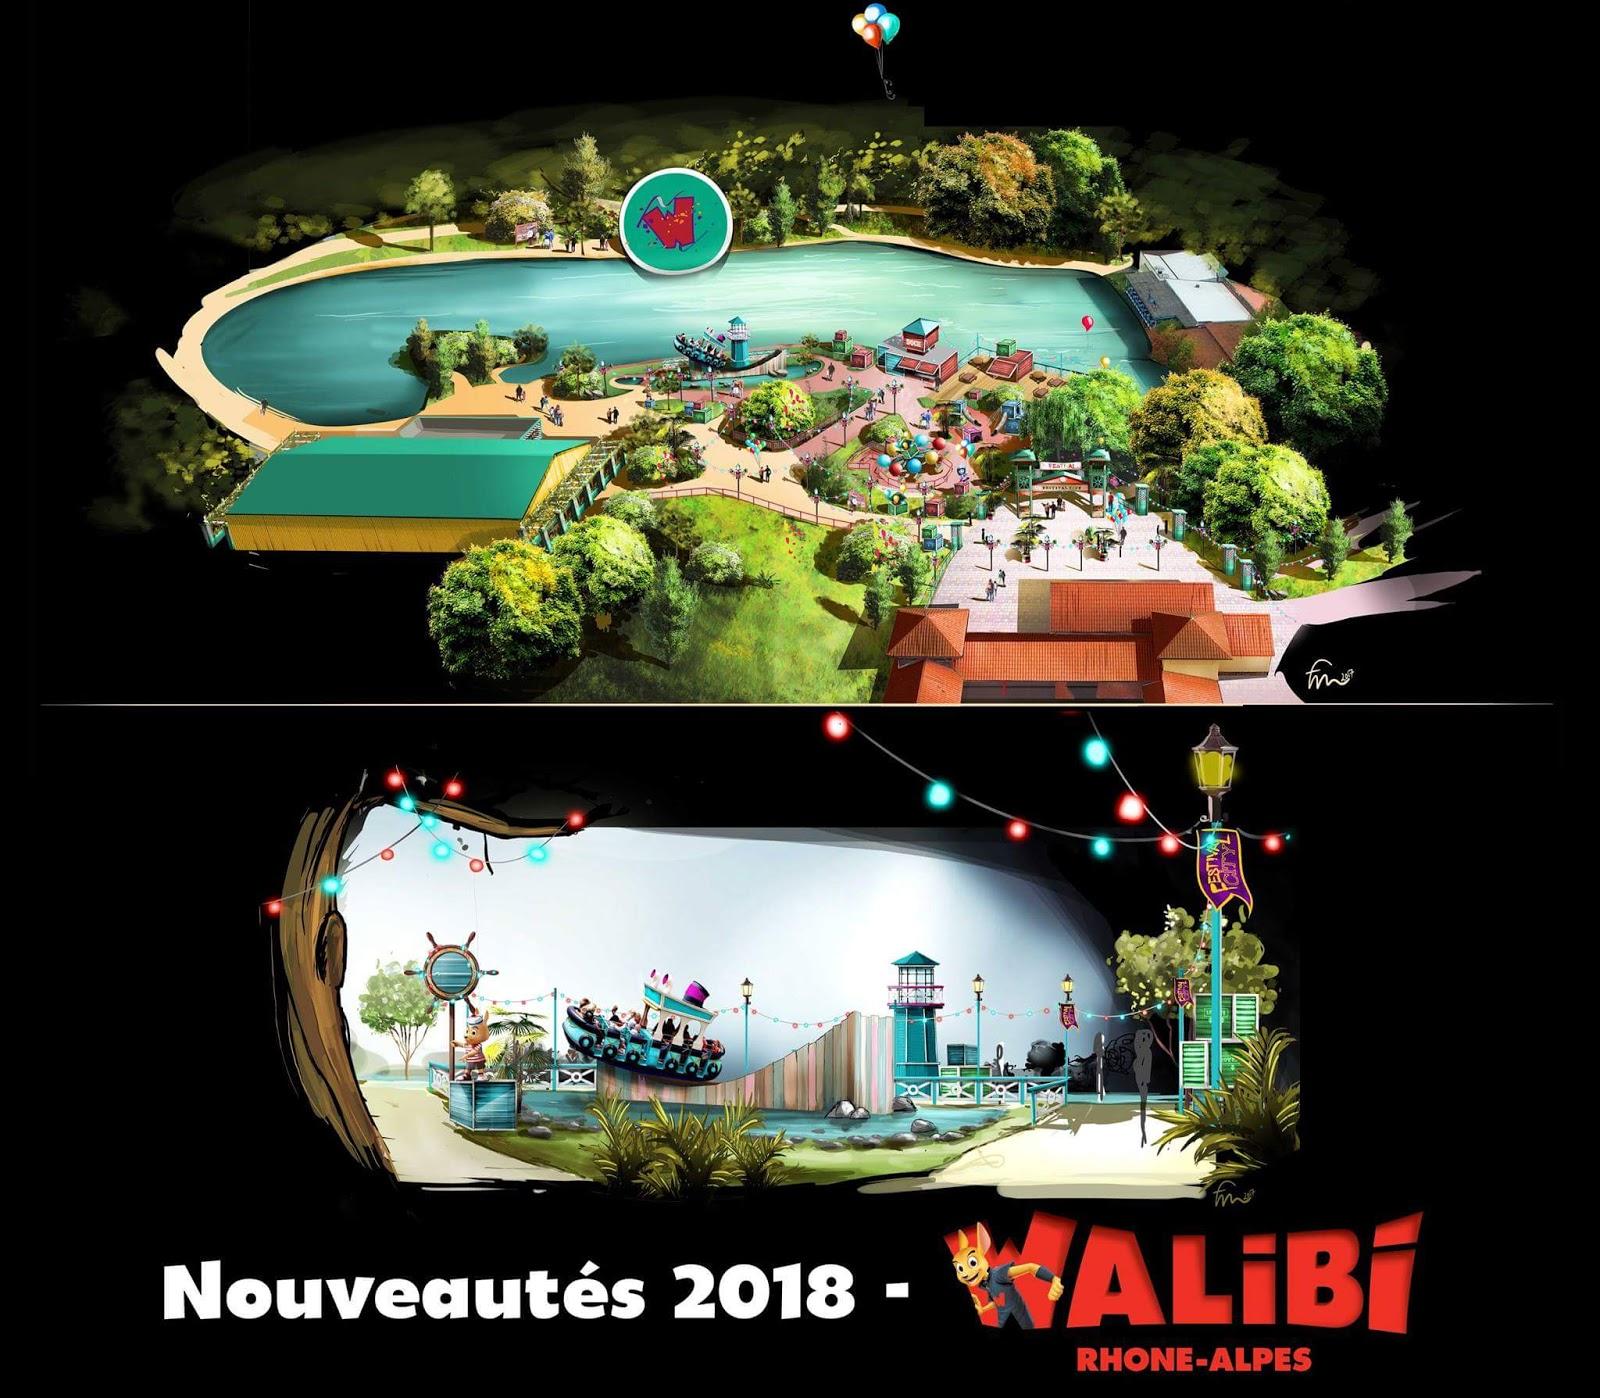 walibi festival